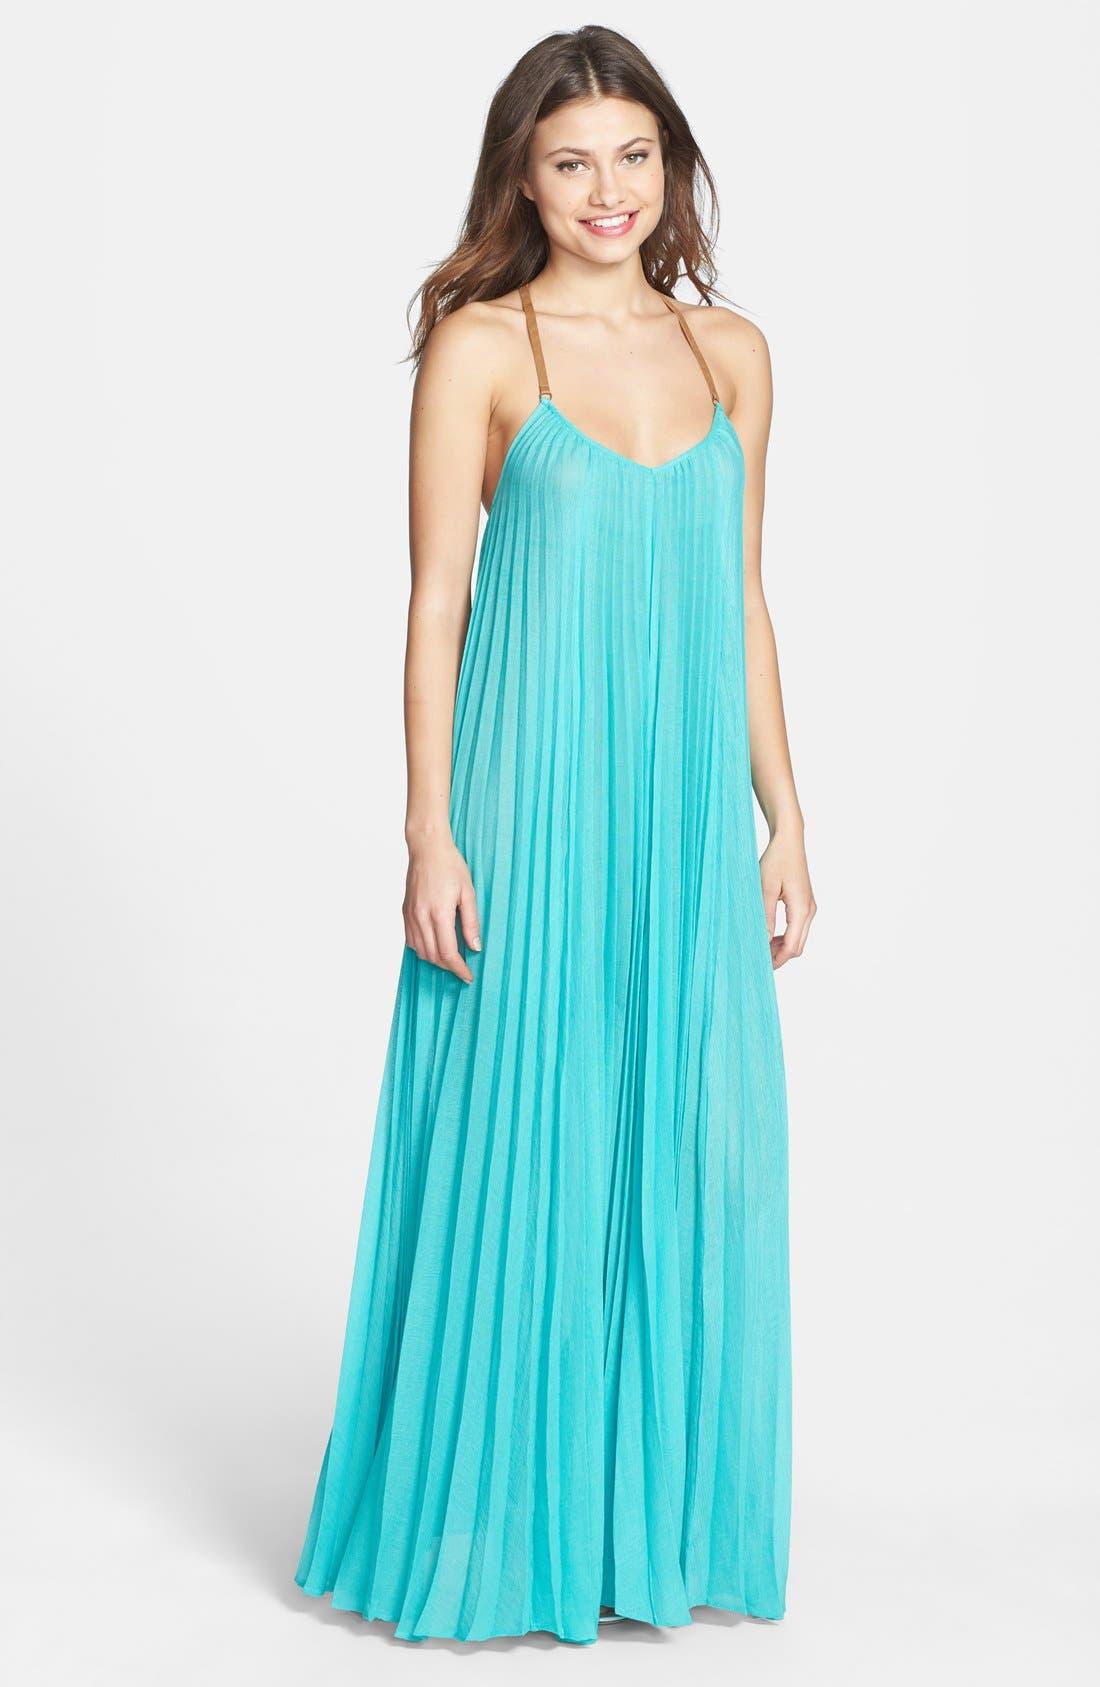 Alternate Image 1 Selected - BCBGMAXAZRIA 'Brynna' T-Strap Back Maxi Dress